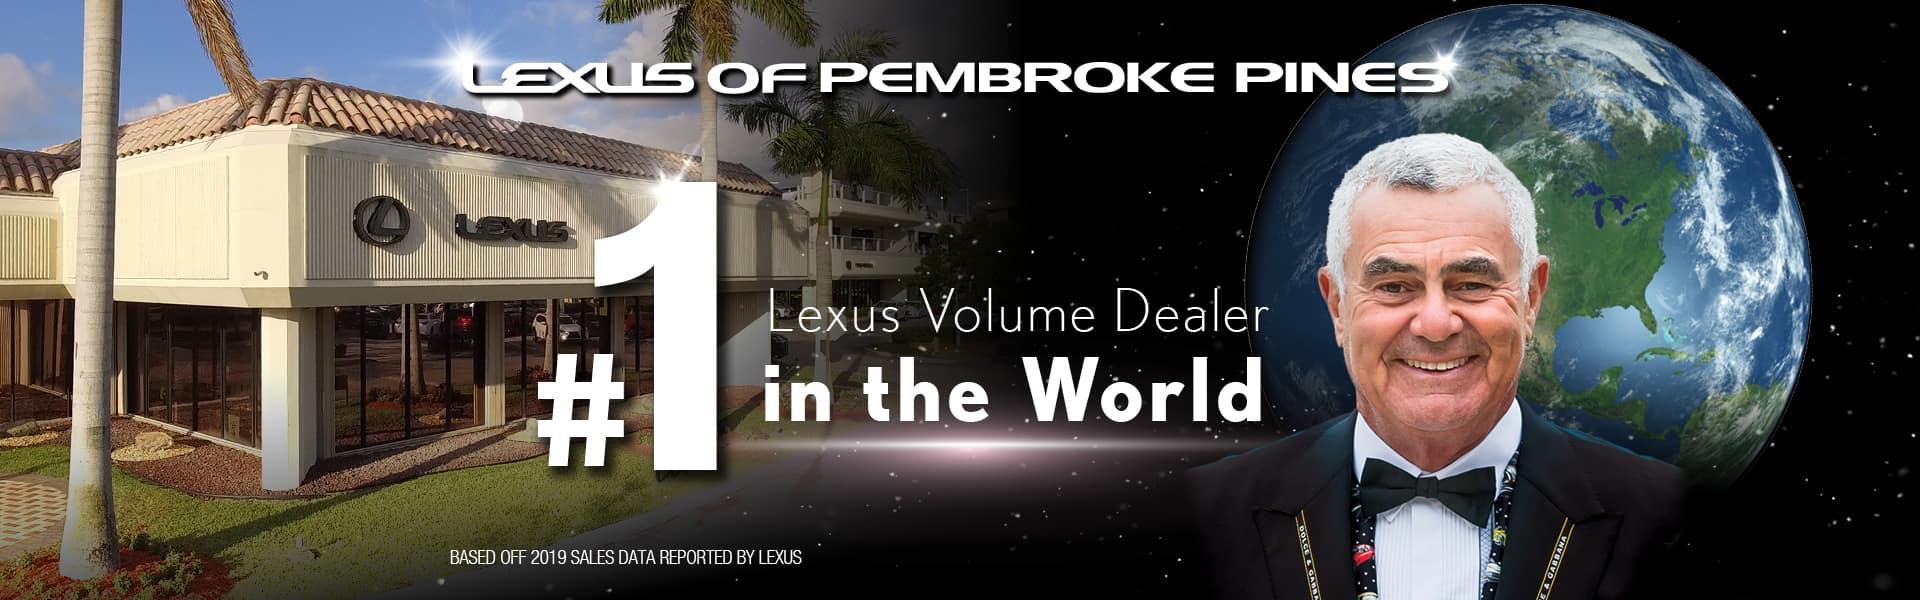 #1 Lexus Dealer in the World